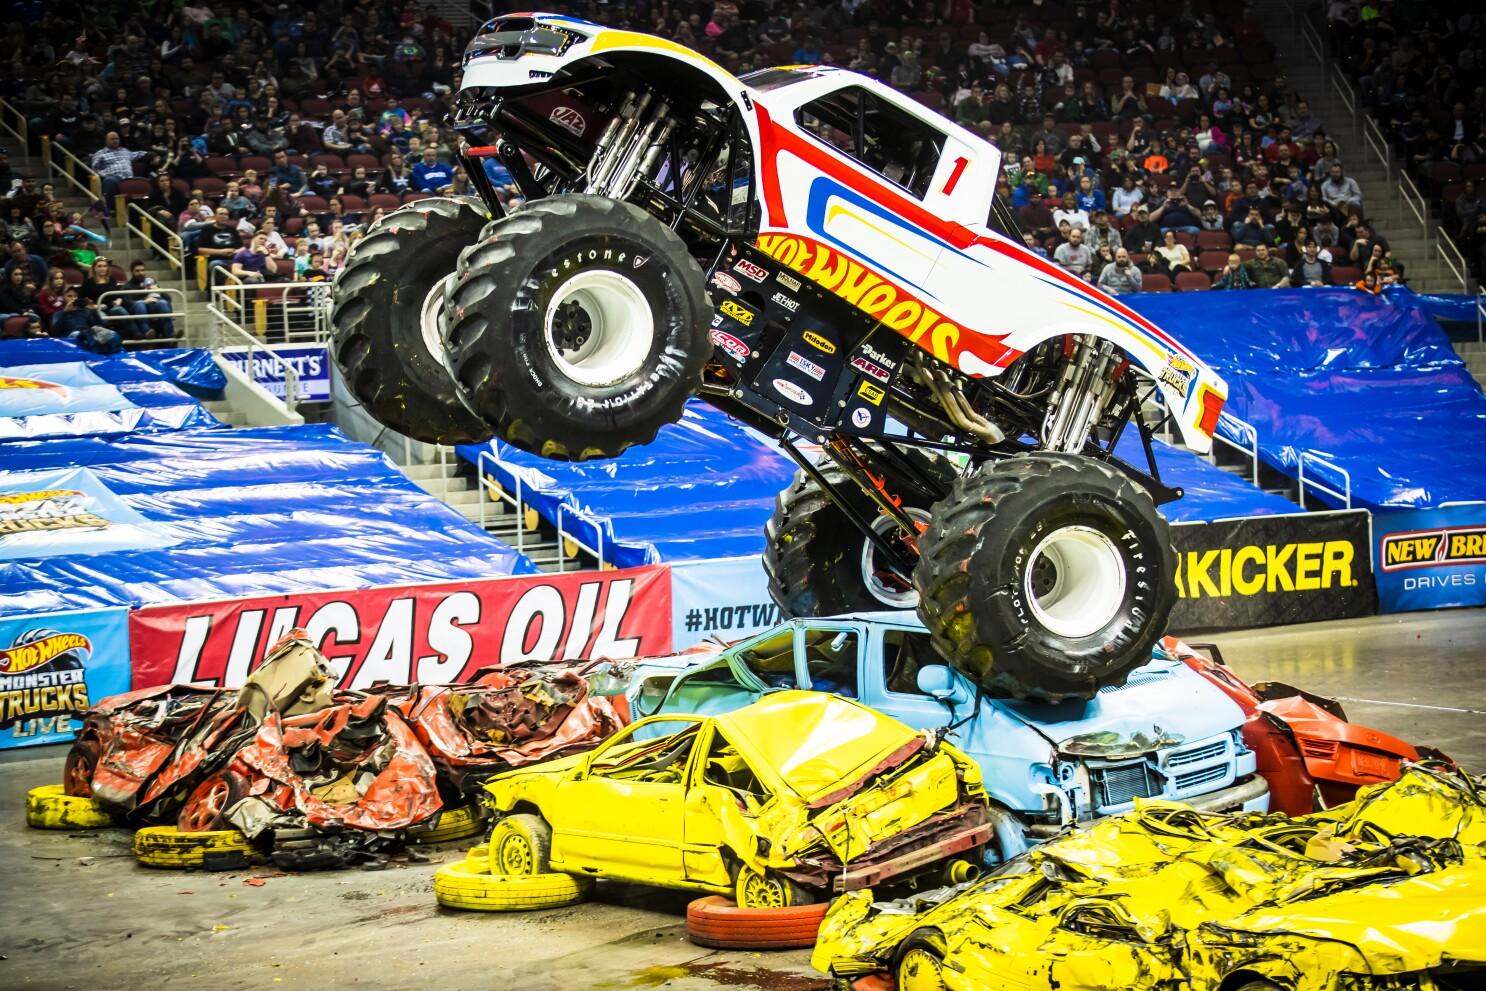 Hot Wheels Monster Trucks Roaring Into San Diego The San Diego Union Tribune